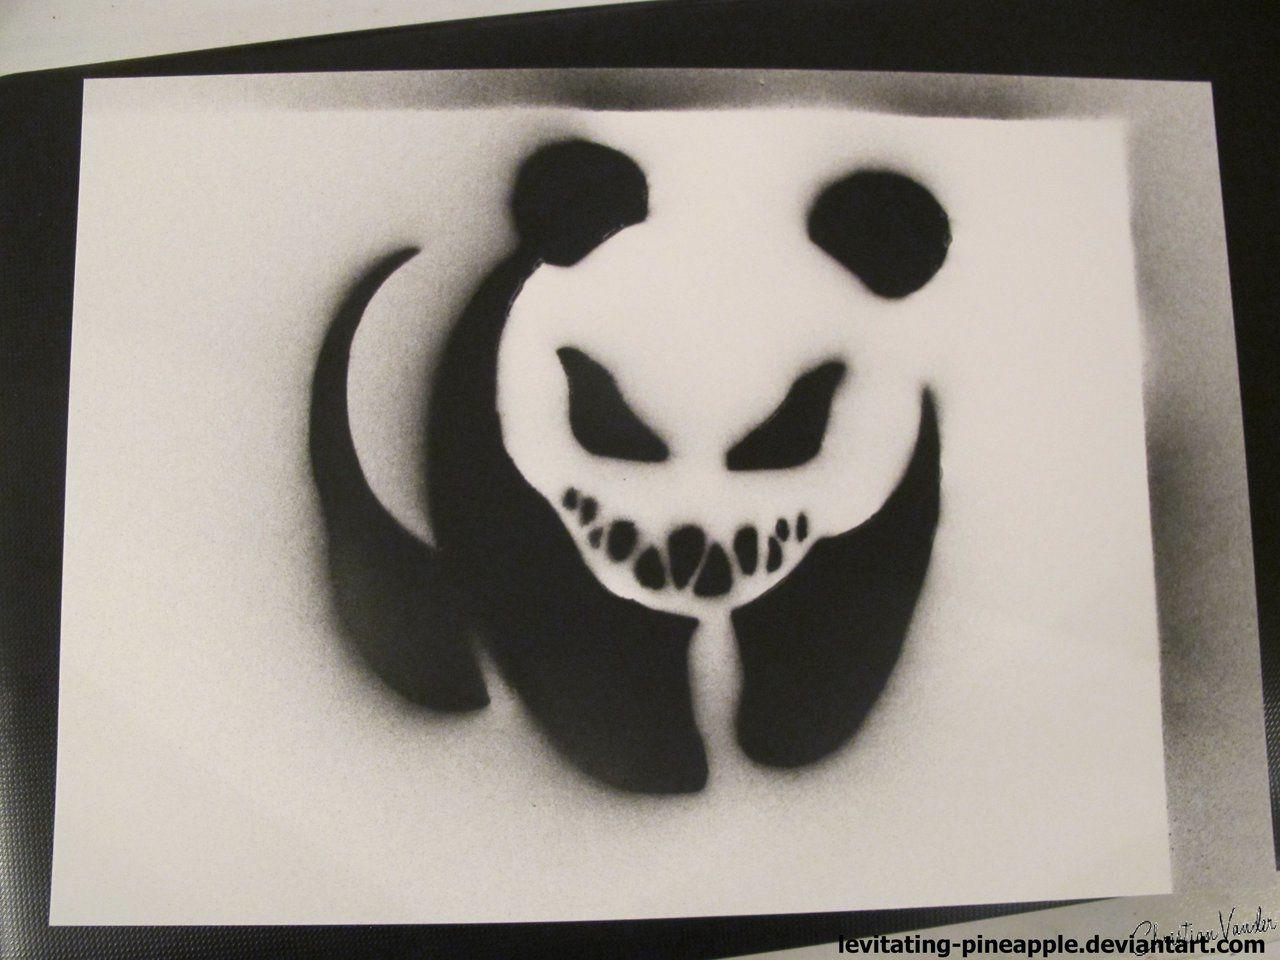 spray paint stencil designs - Parfu kaptanband co